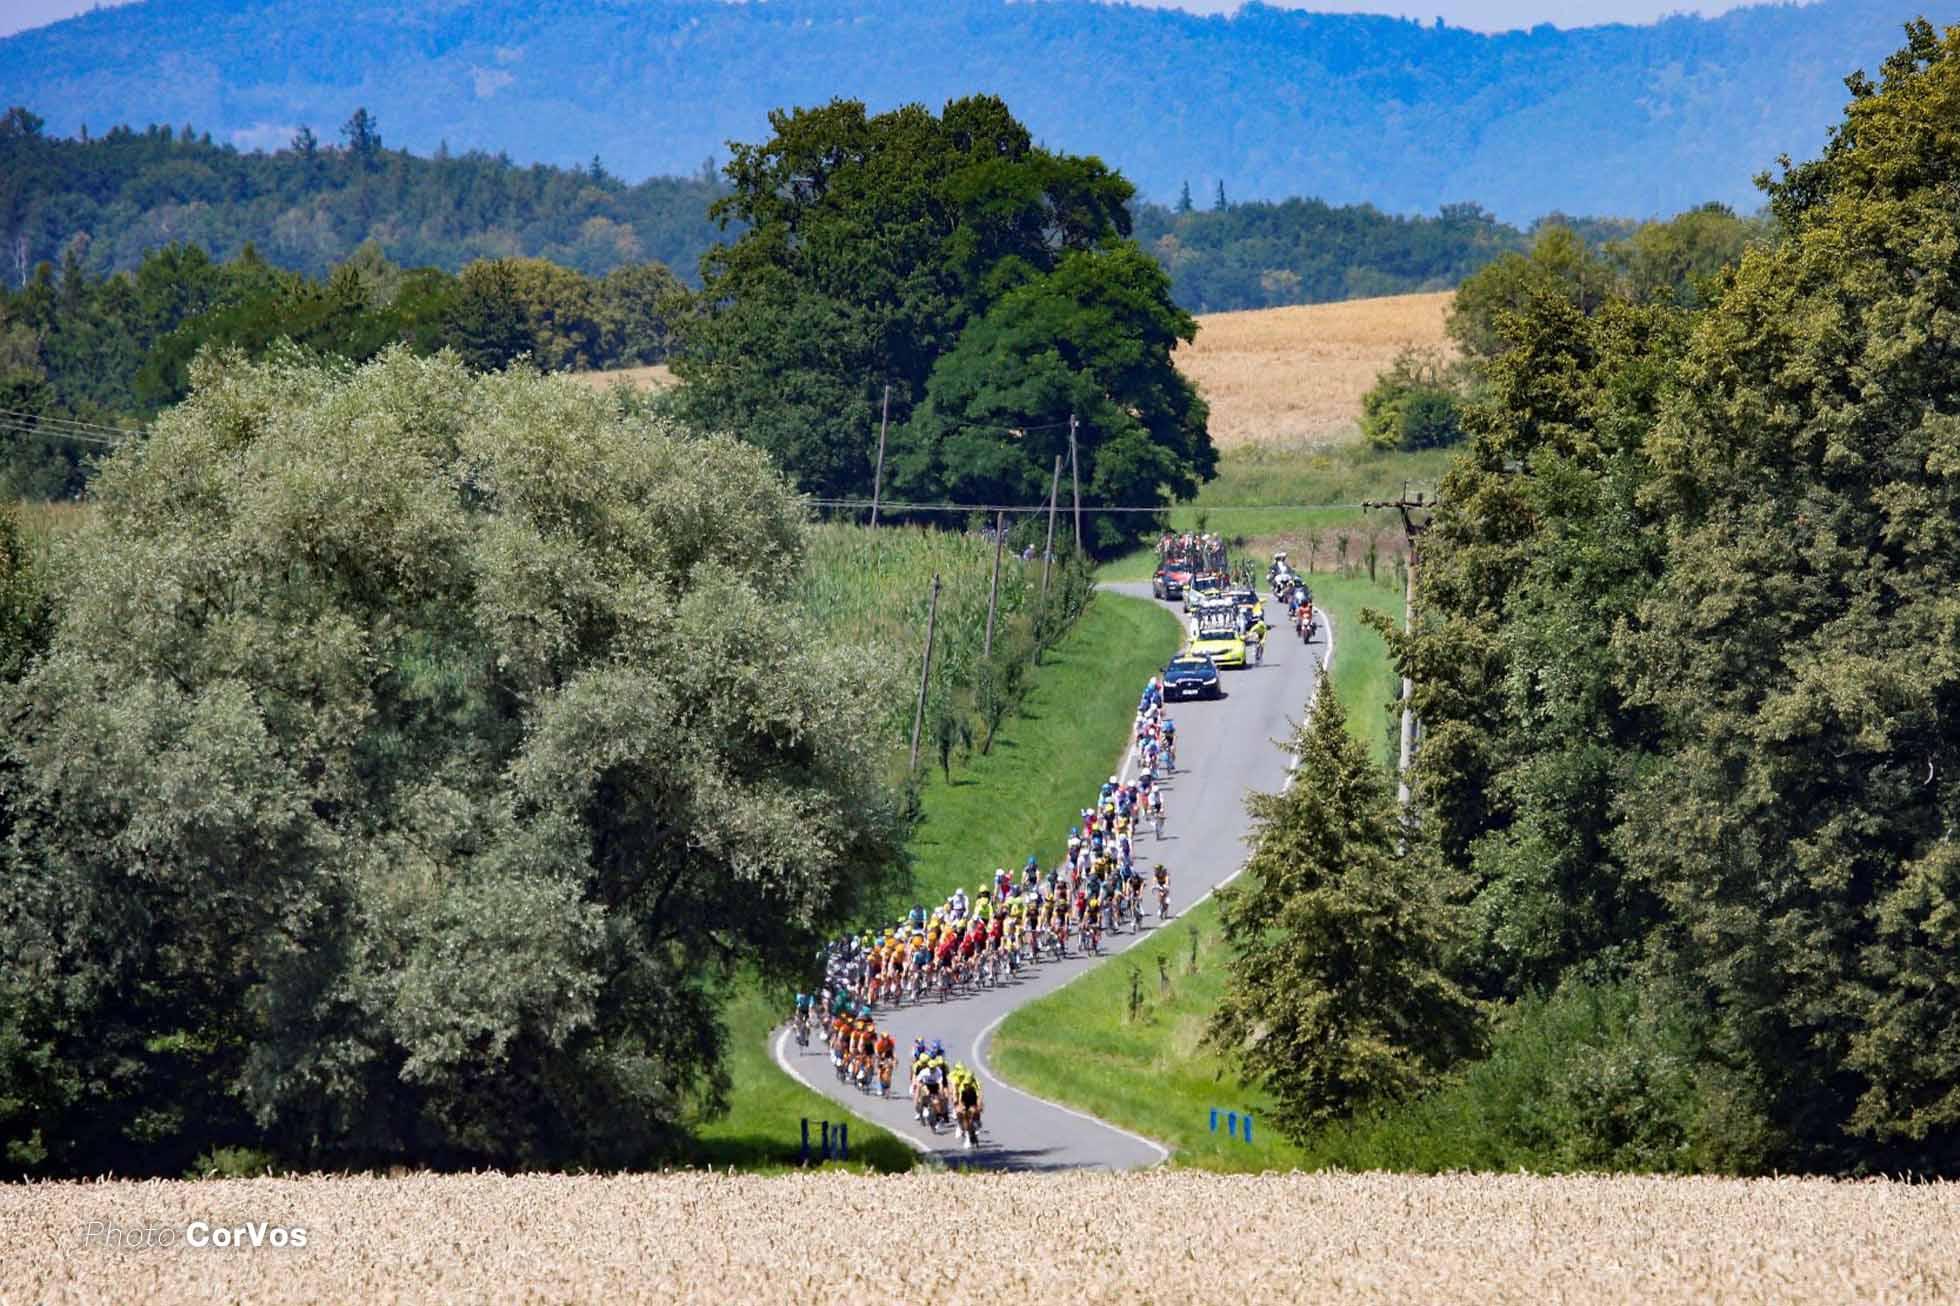 Czech Tour stage3 (2.1) チェコの丘陵地帯を行く集団 Photo CorVos